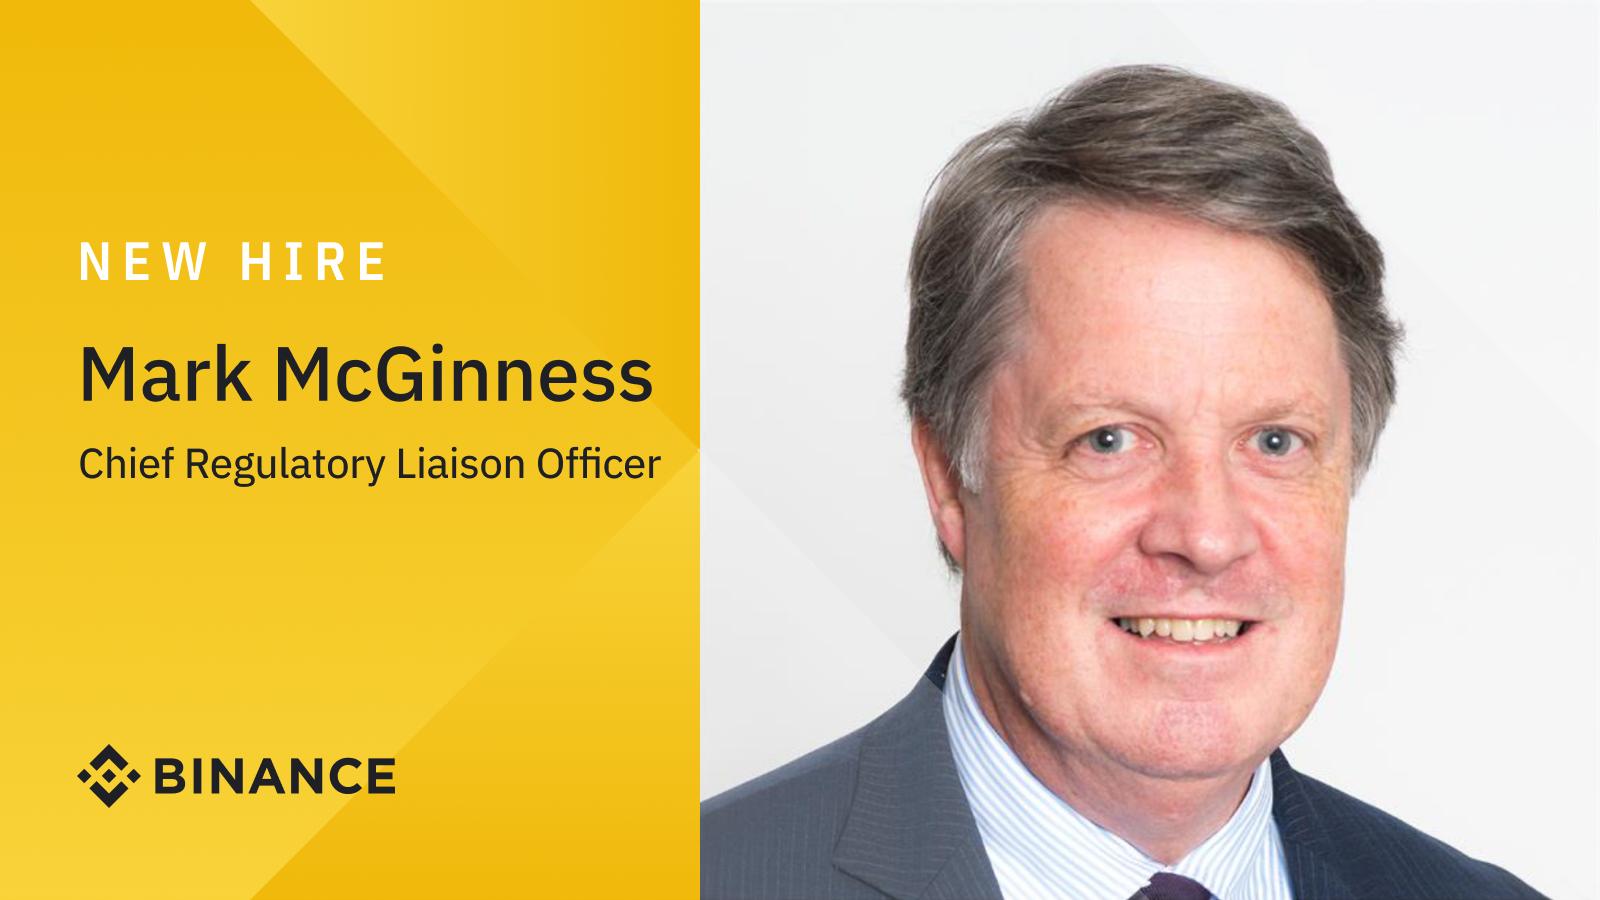 Mark McGinness Joins Crypto Platform Binance as its First Chief Regulatory Liaison Officer